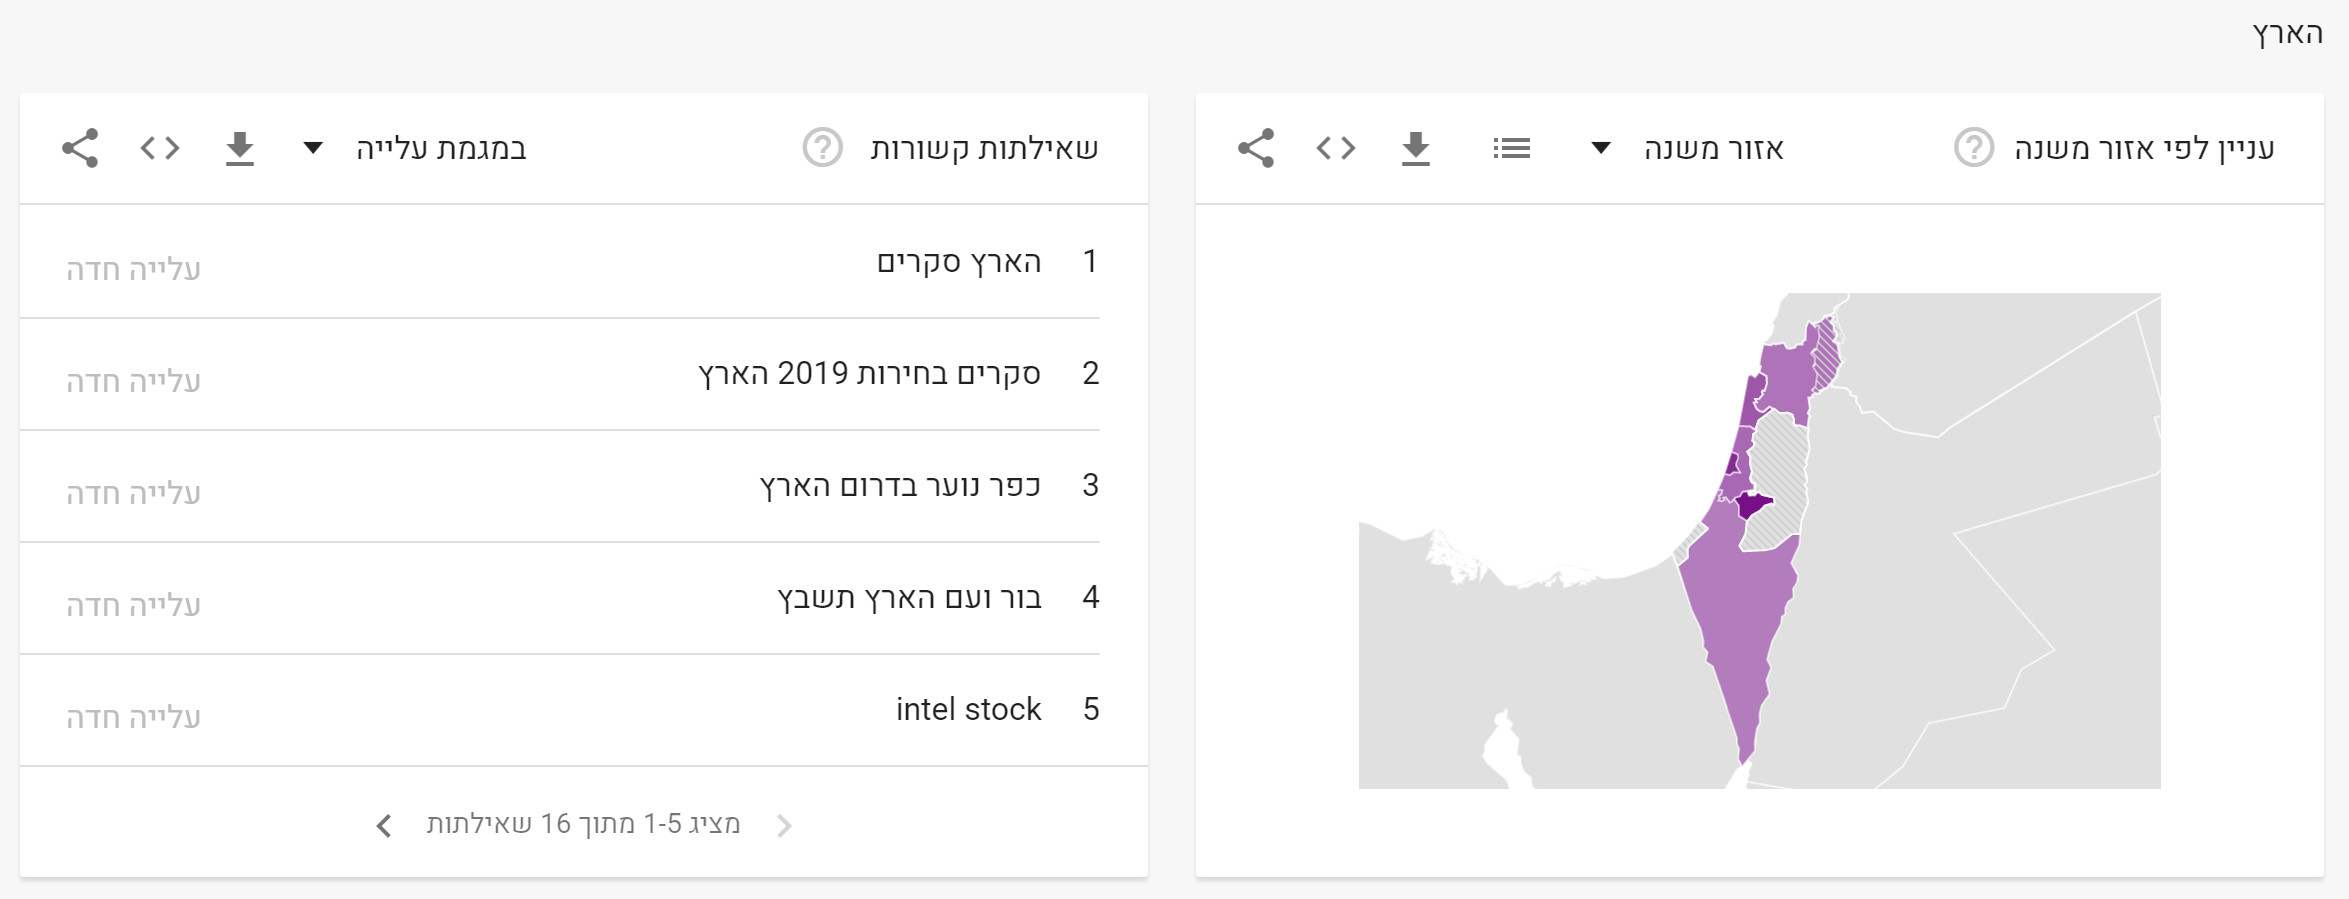 News 2019 in Google (11)